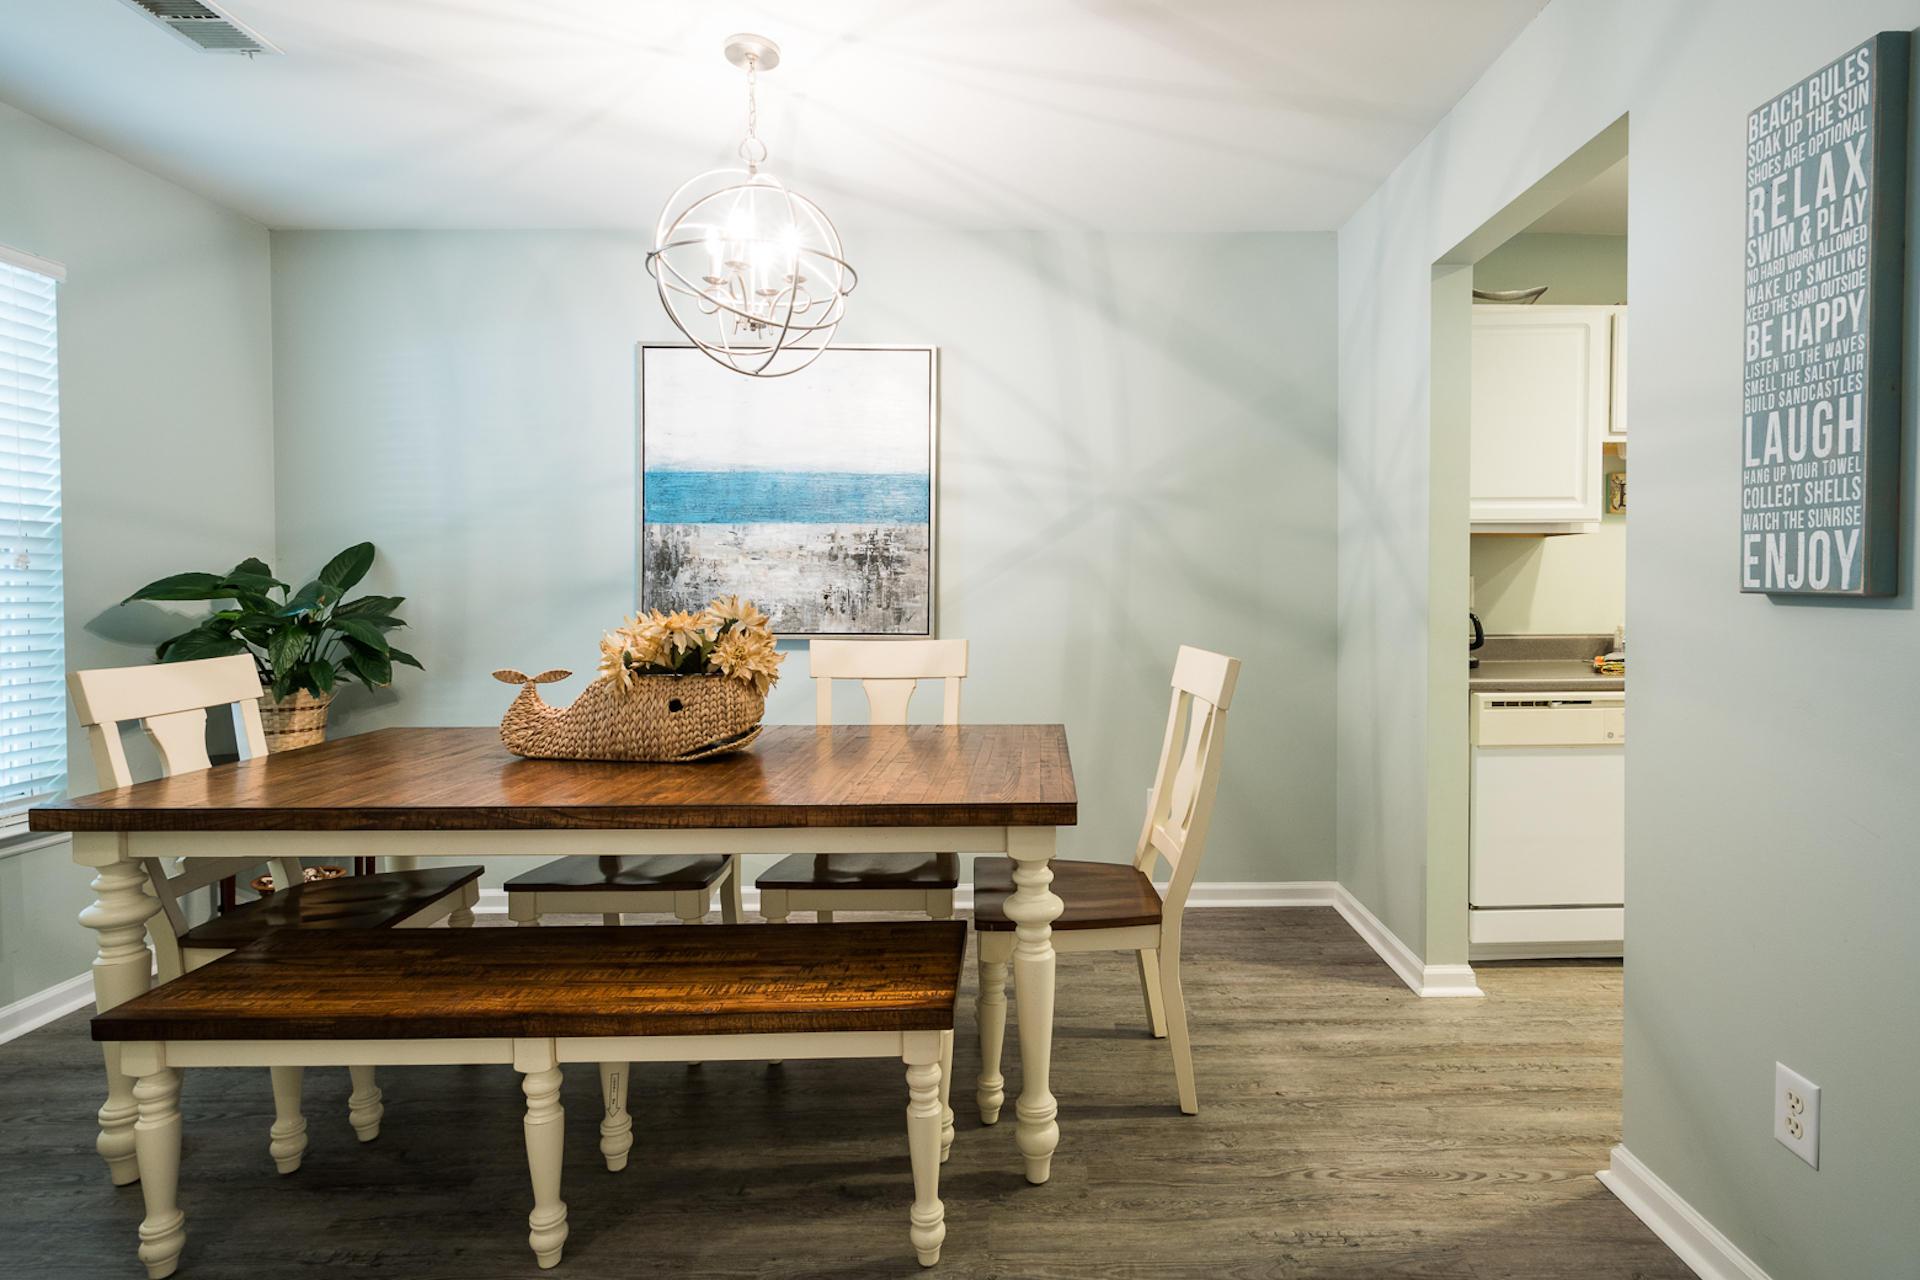 Meridian Place Homes For Sale - 1420 Amanda Park, Charleston, SC - 2